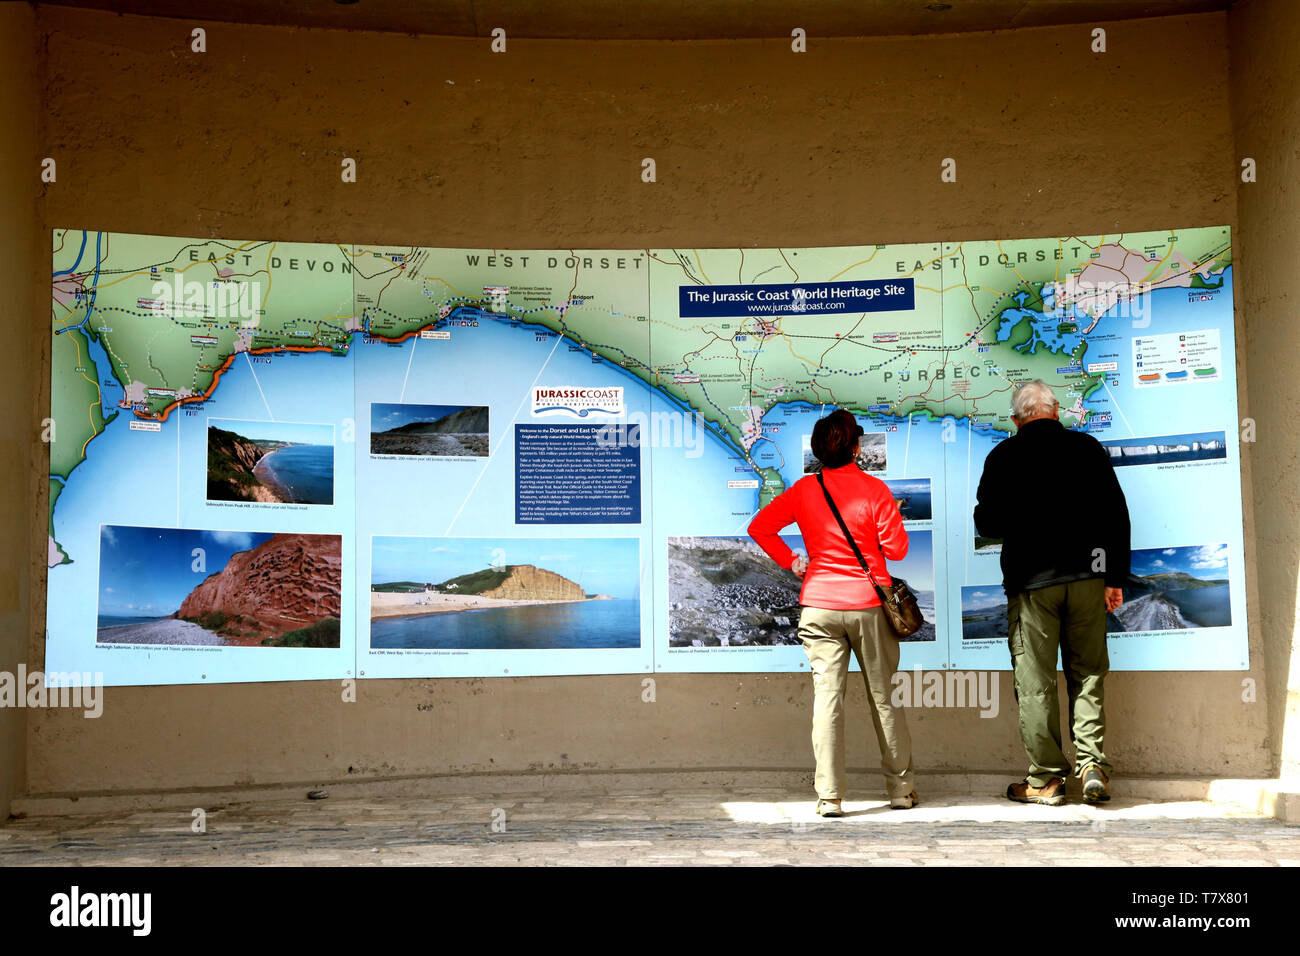 Lyme Regis, Dorset - Elderly tourists viewing The Jurassic Coast World Heritage Site map, 2019 - Stock Image